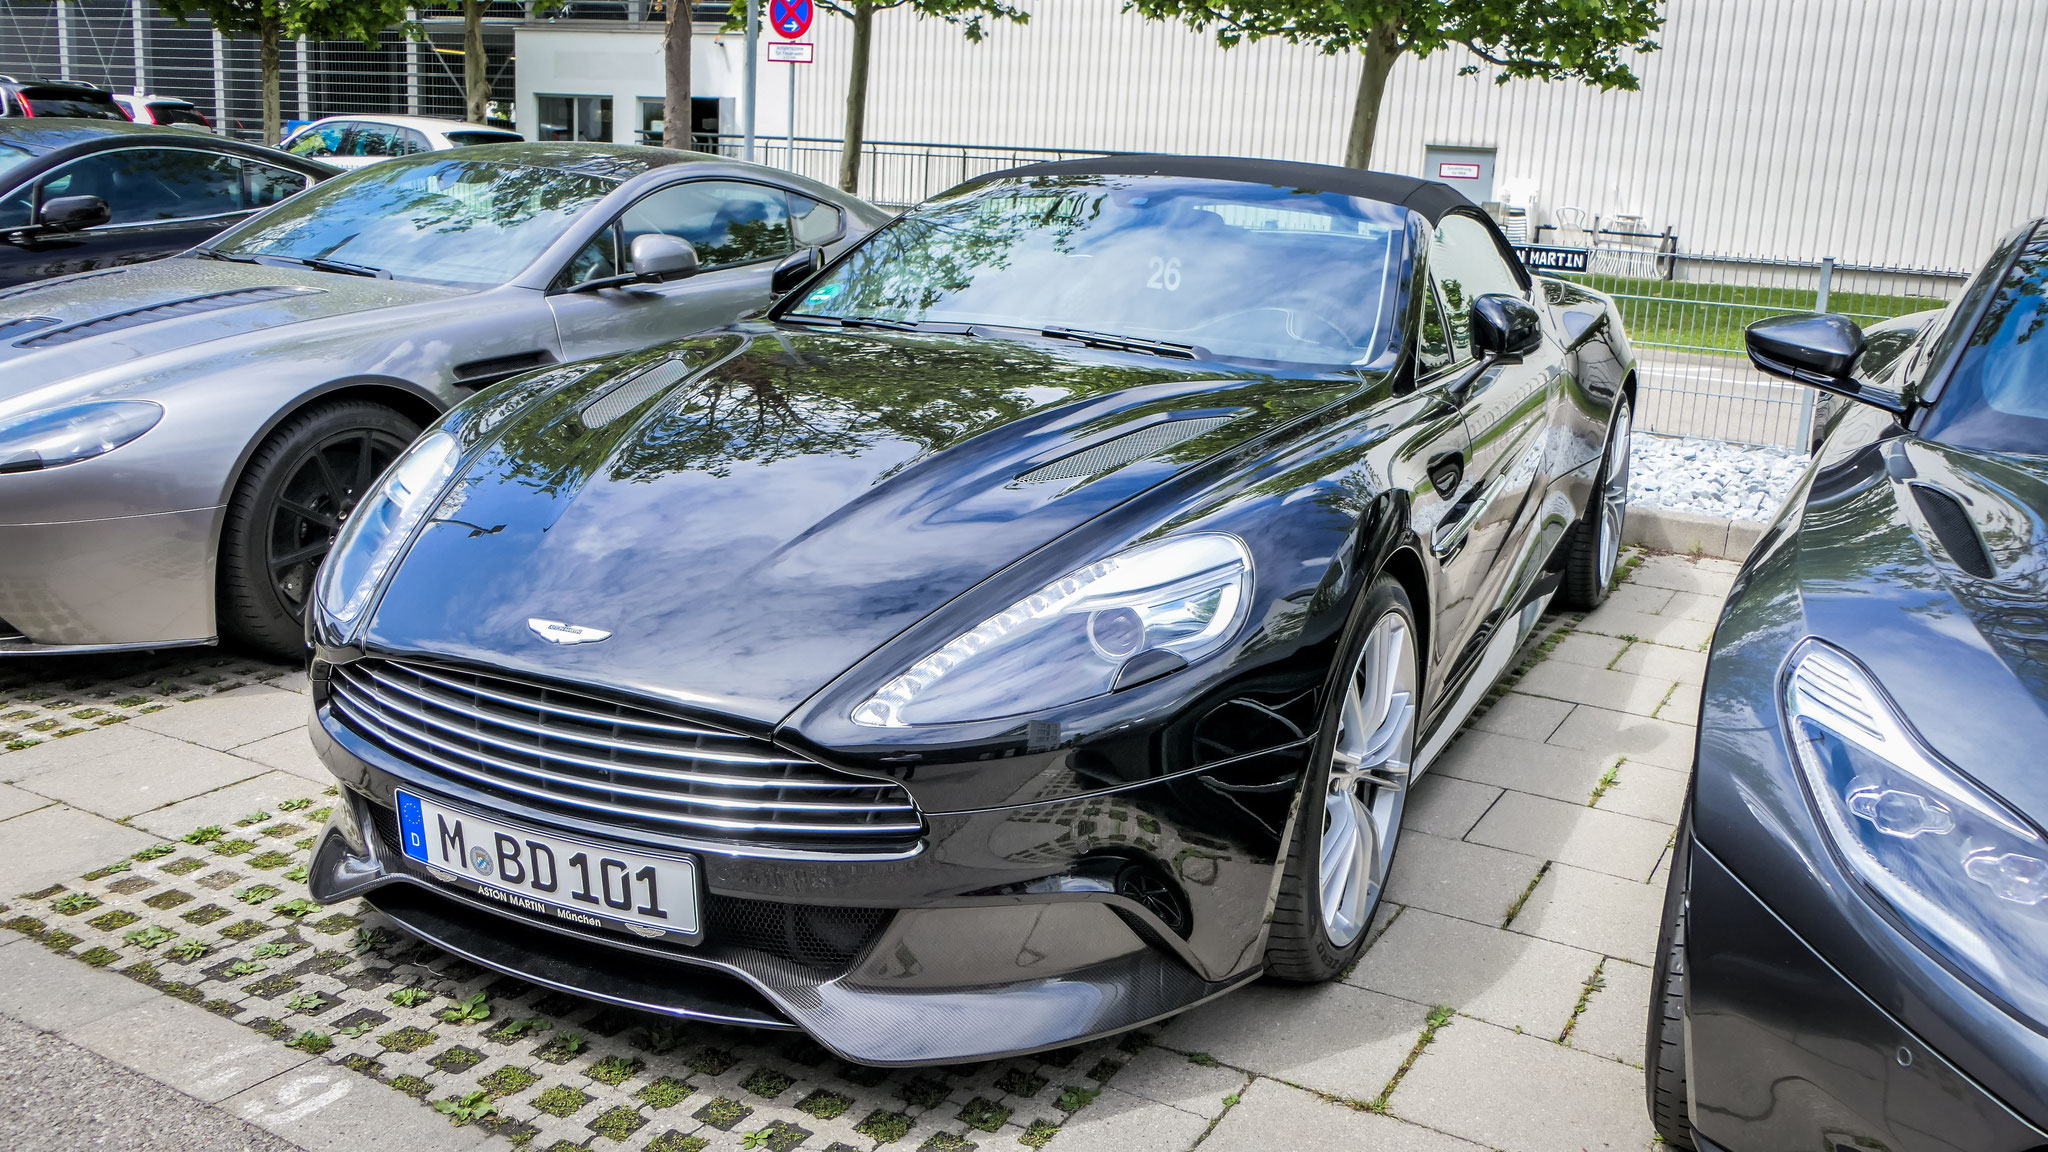 Aston Martin Vanquish - M-BD-101